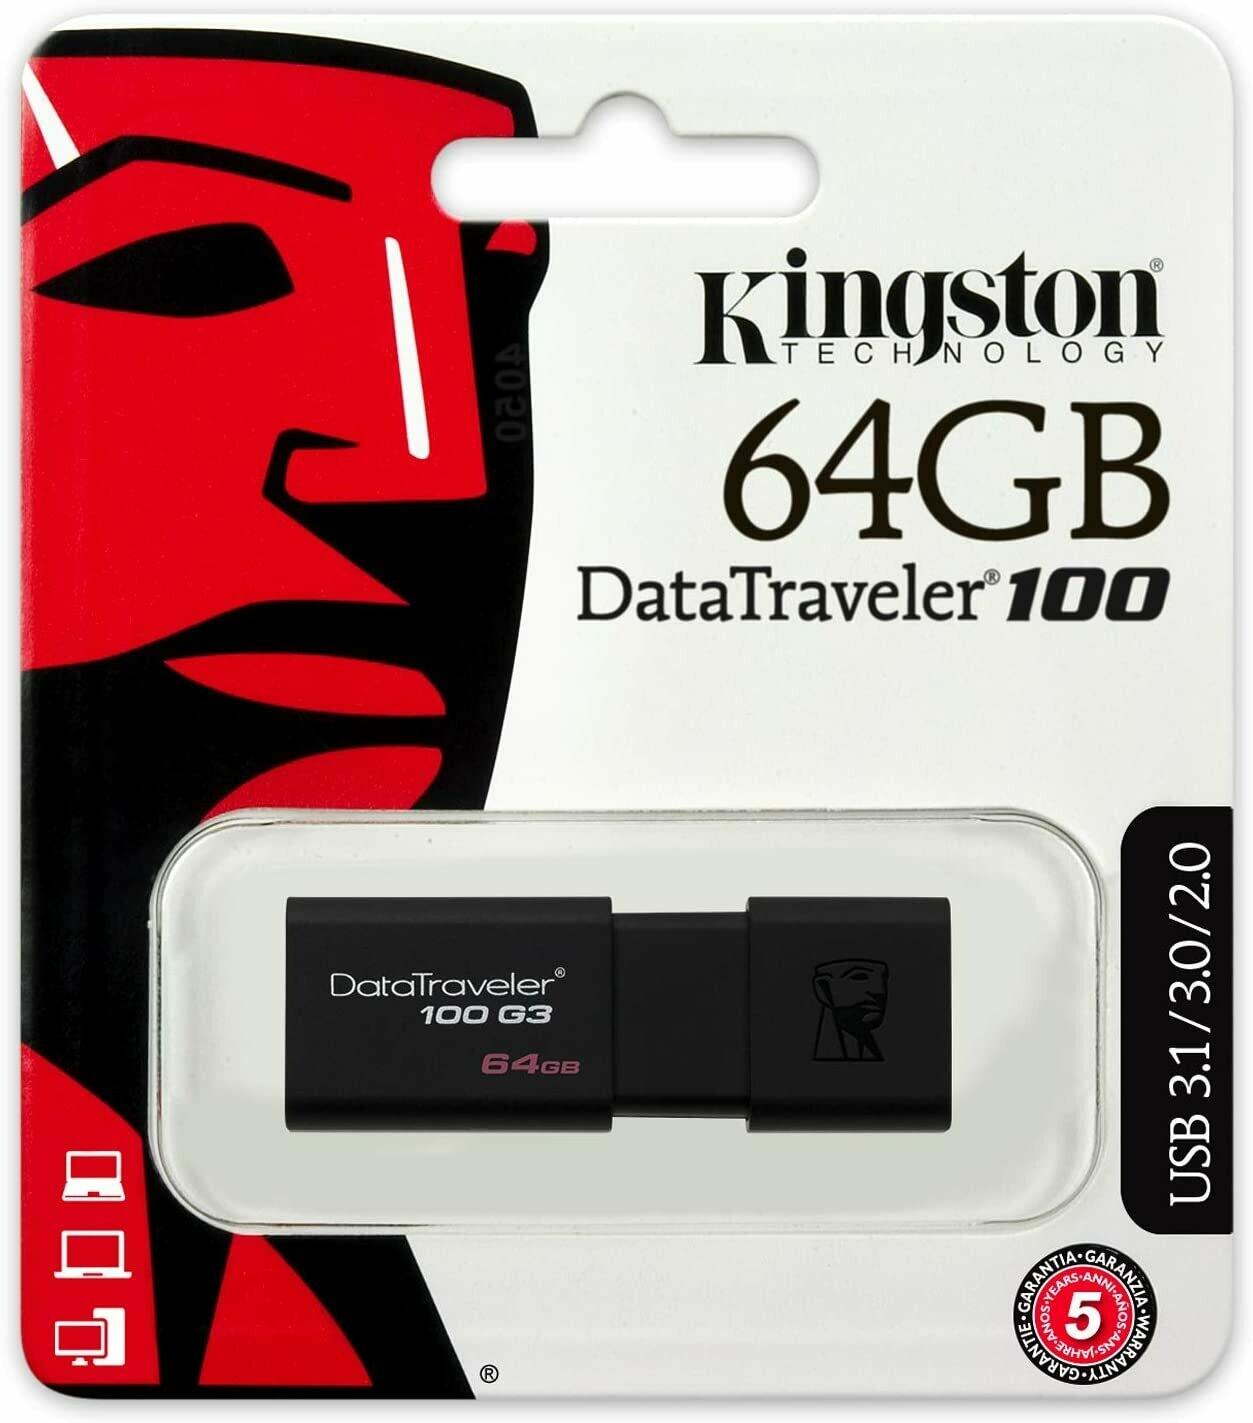 Kingston Digital 64GB 100 G3 USB 3.0 Data Traveler